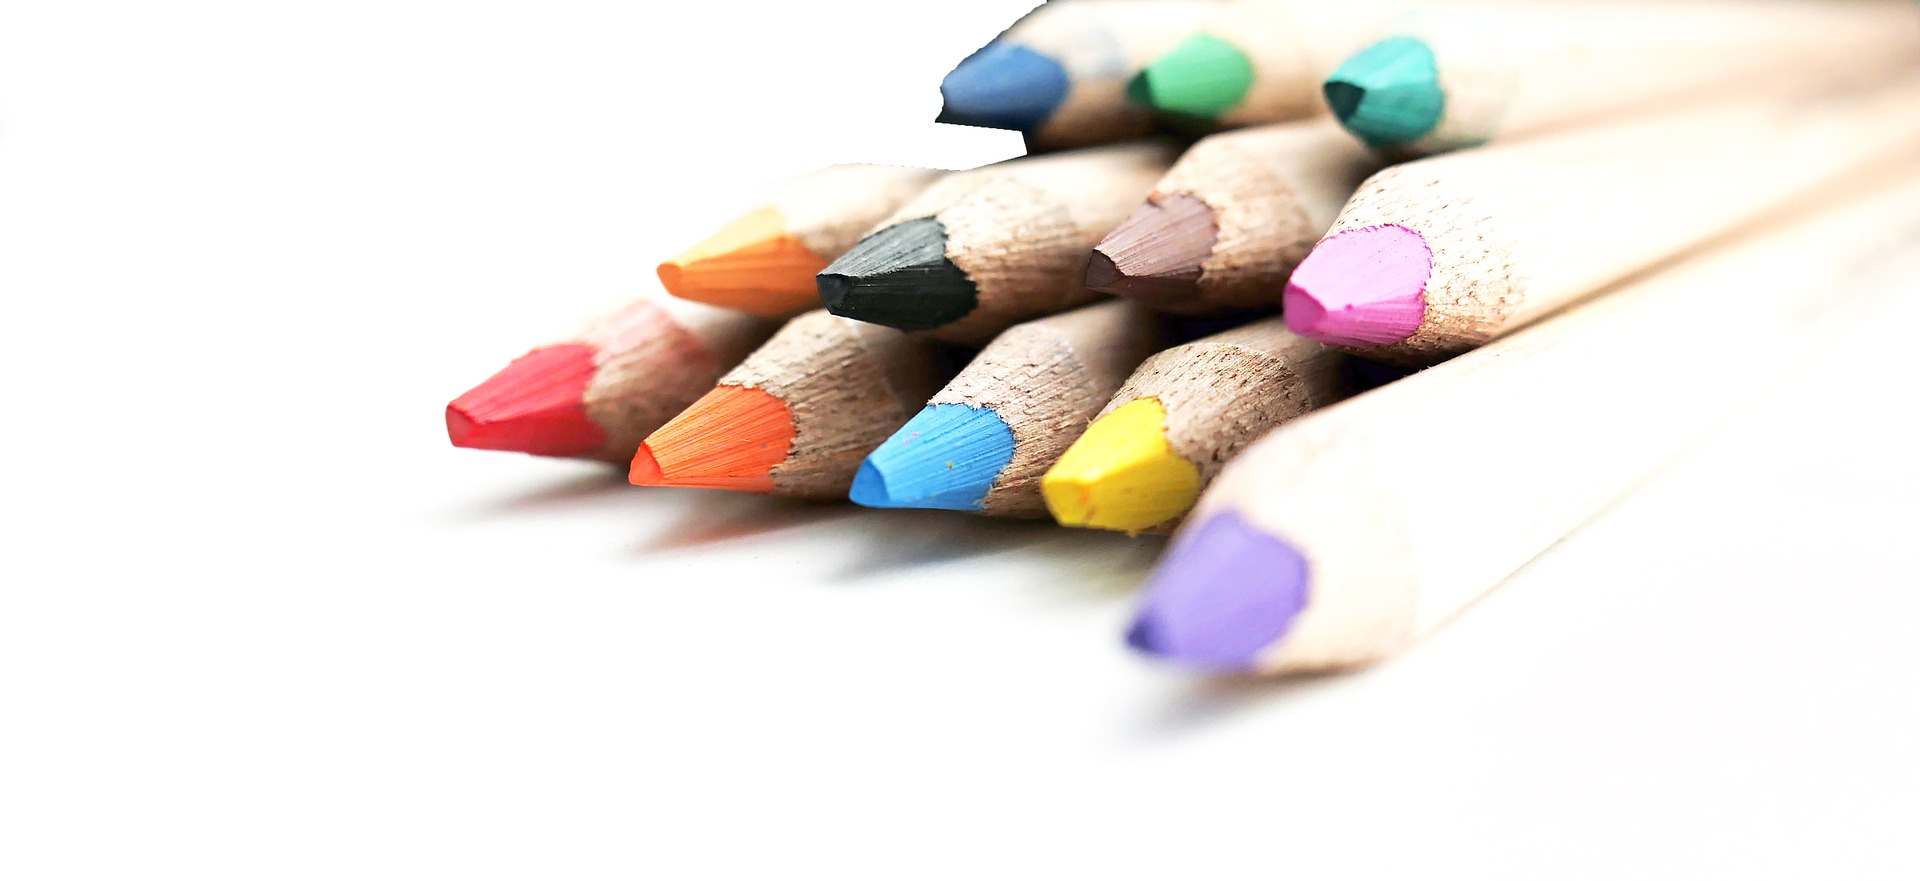 colored-pencils-2127251_1920